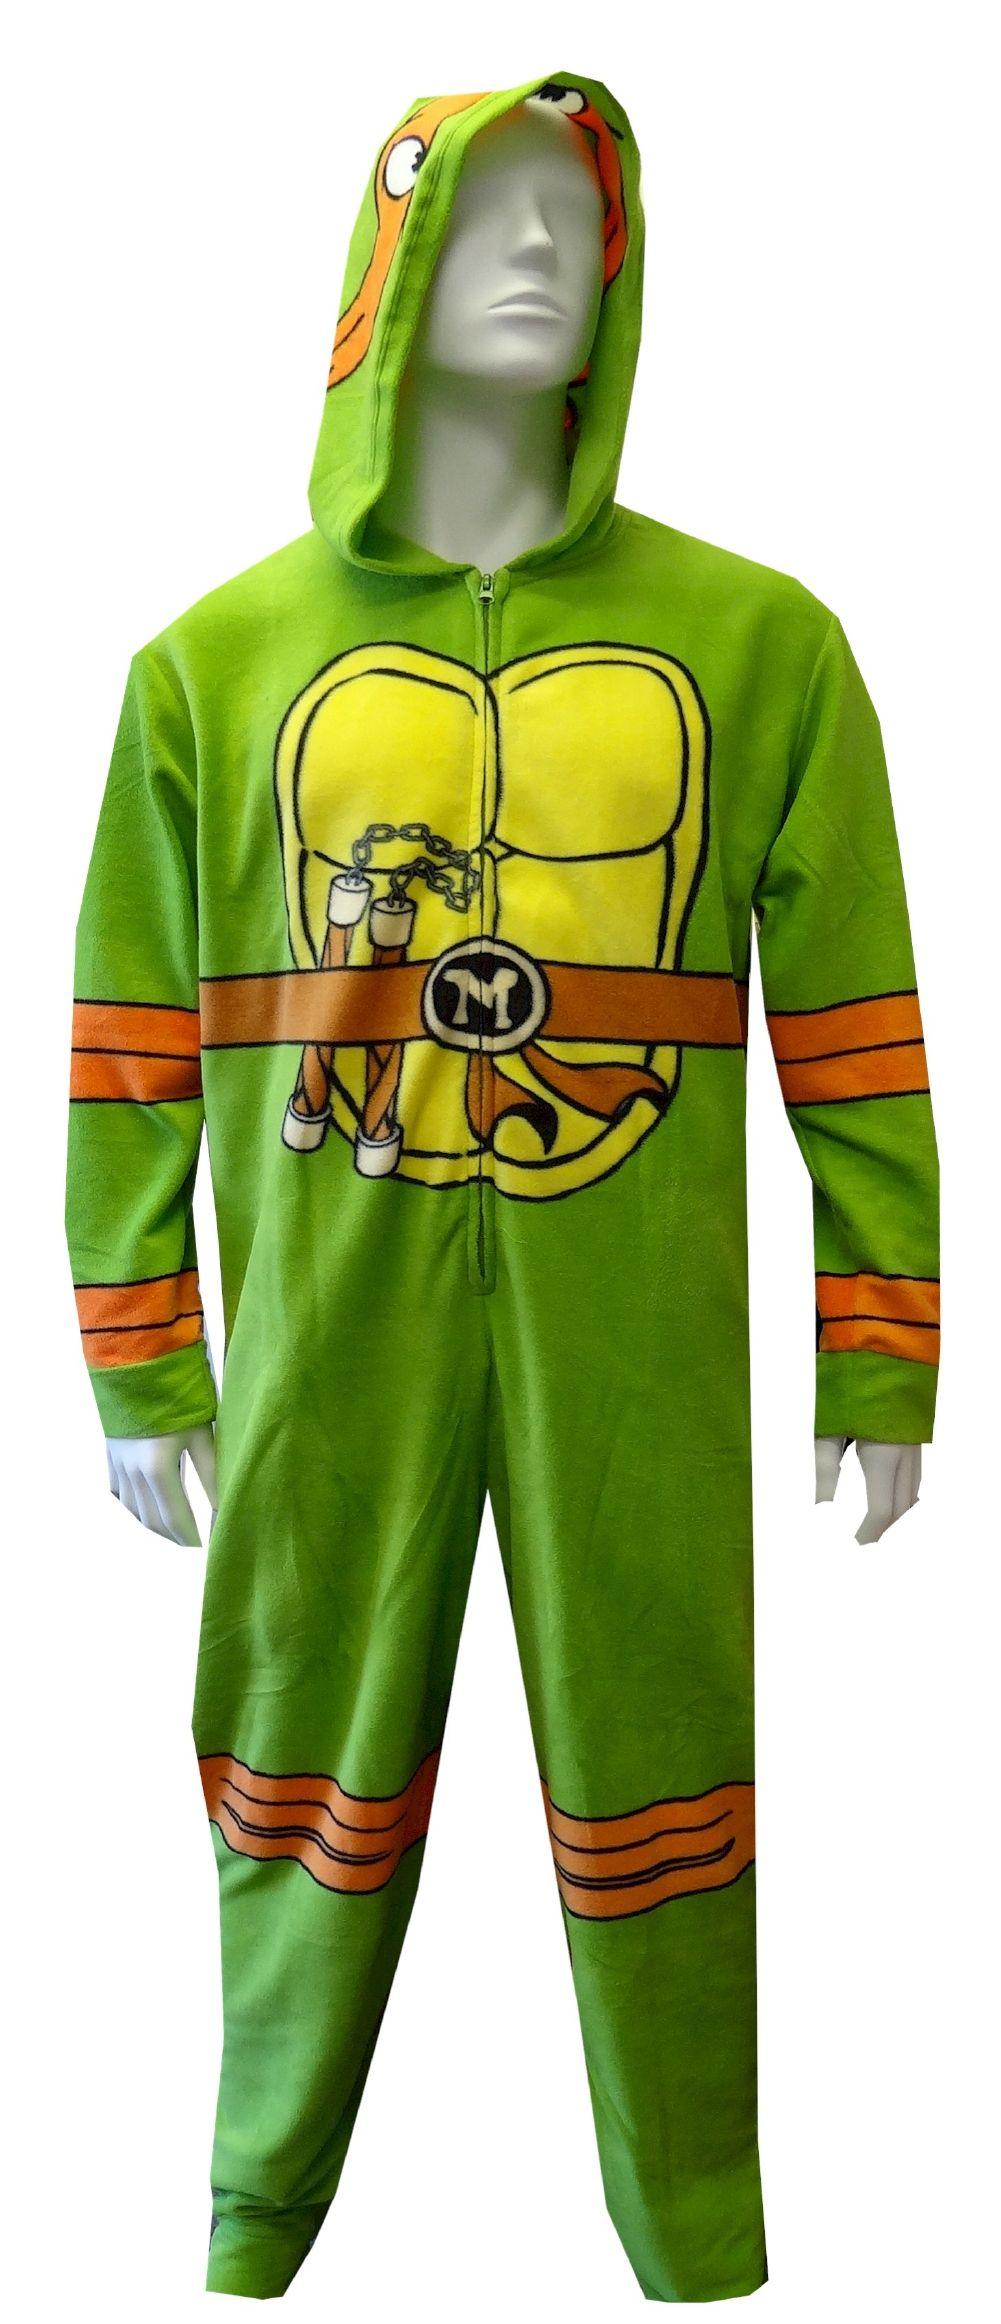 81358bcc5 Teenage Mutant Ninja Turtle Hooded Fleece Onesie Pajama Conquer the ...